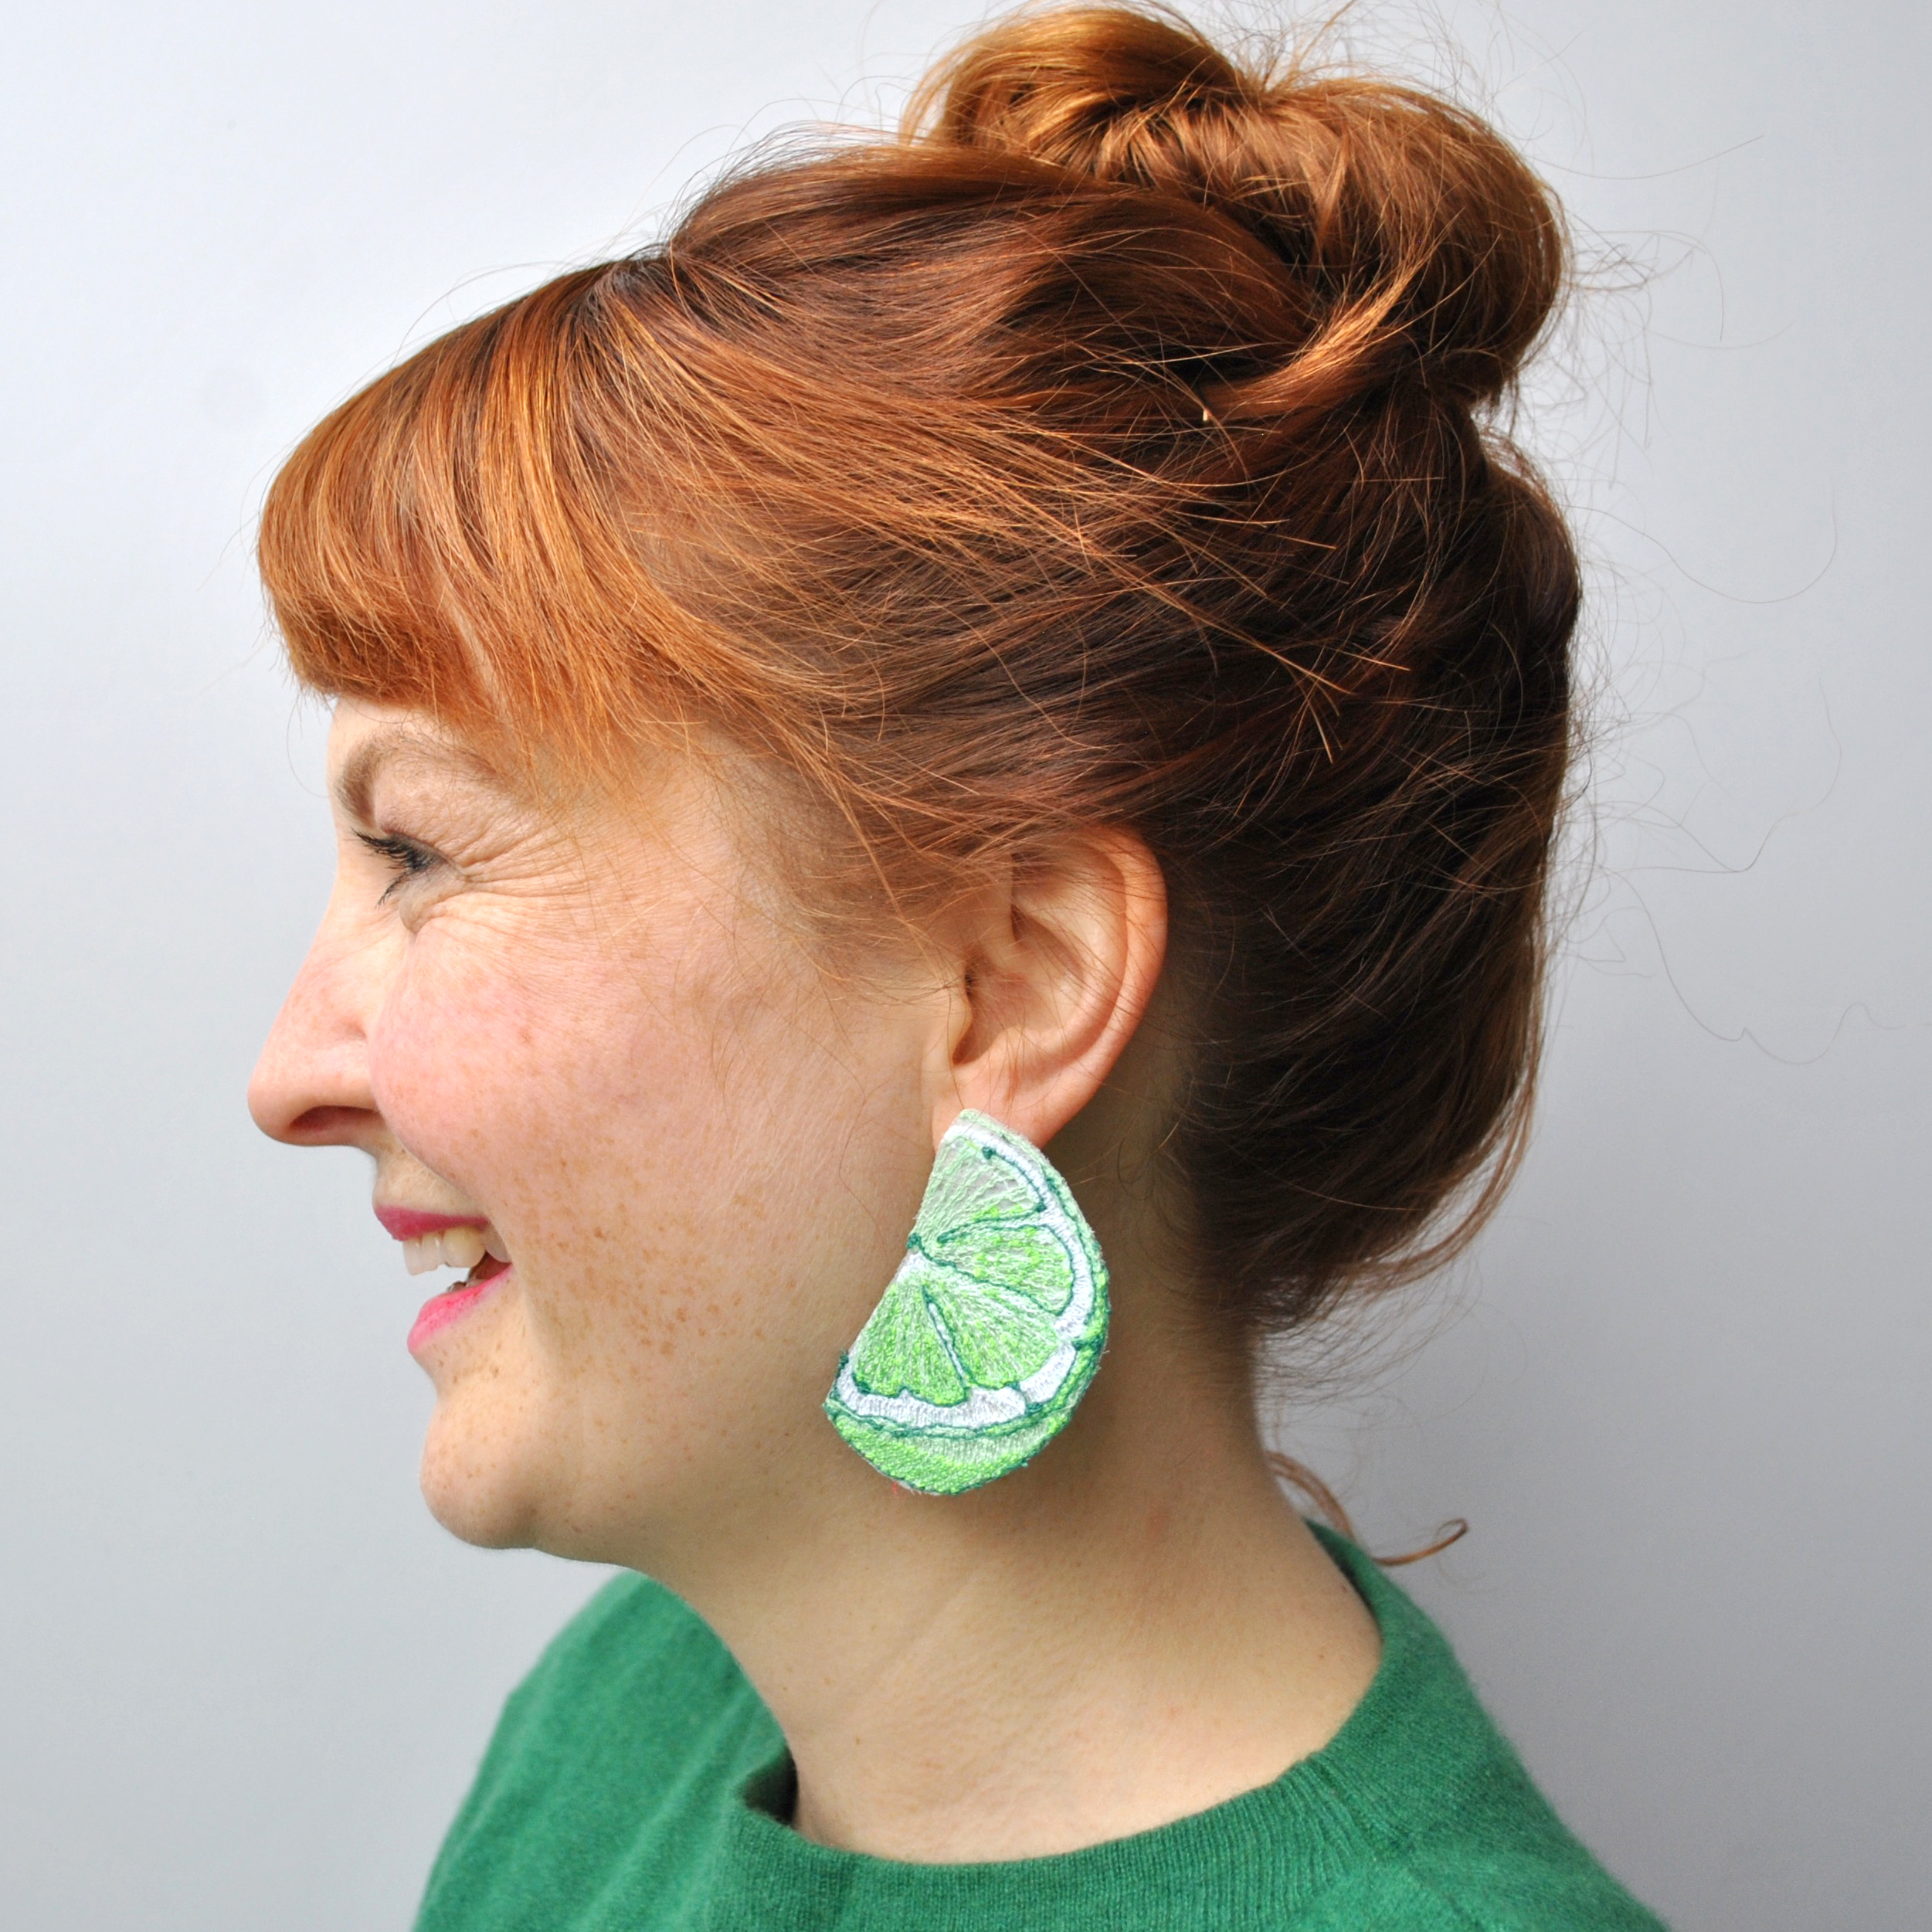 Large Lime Earrings